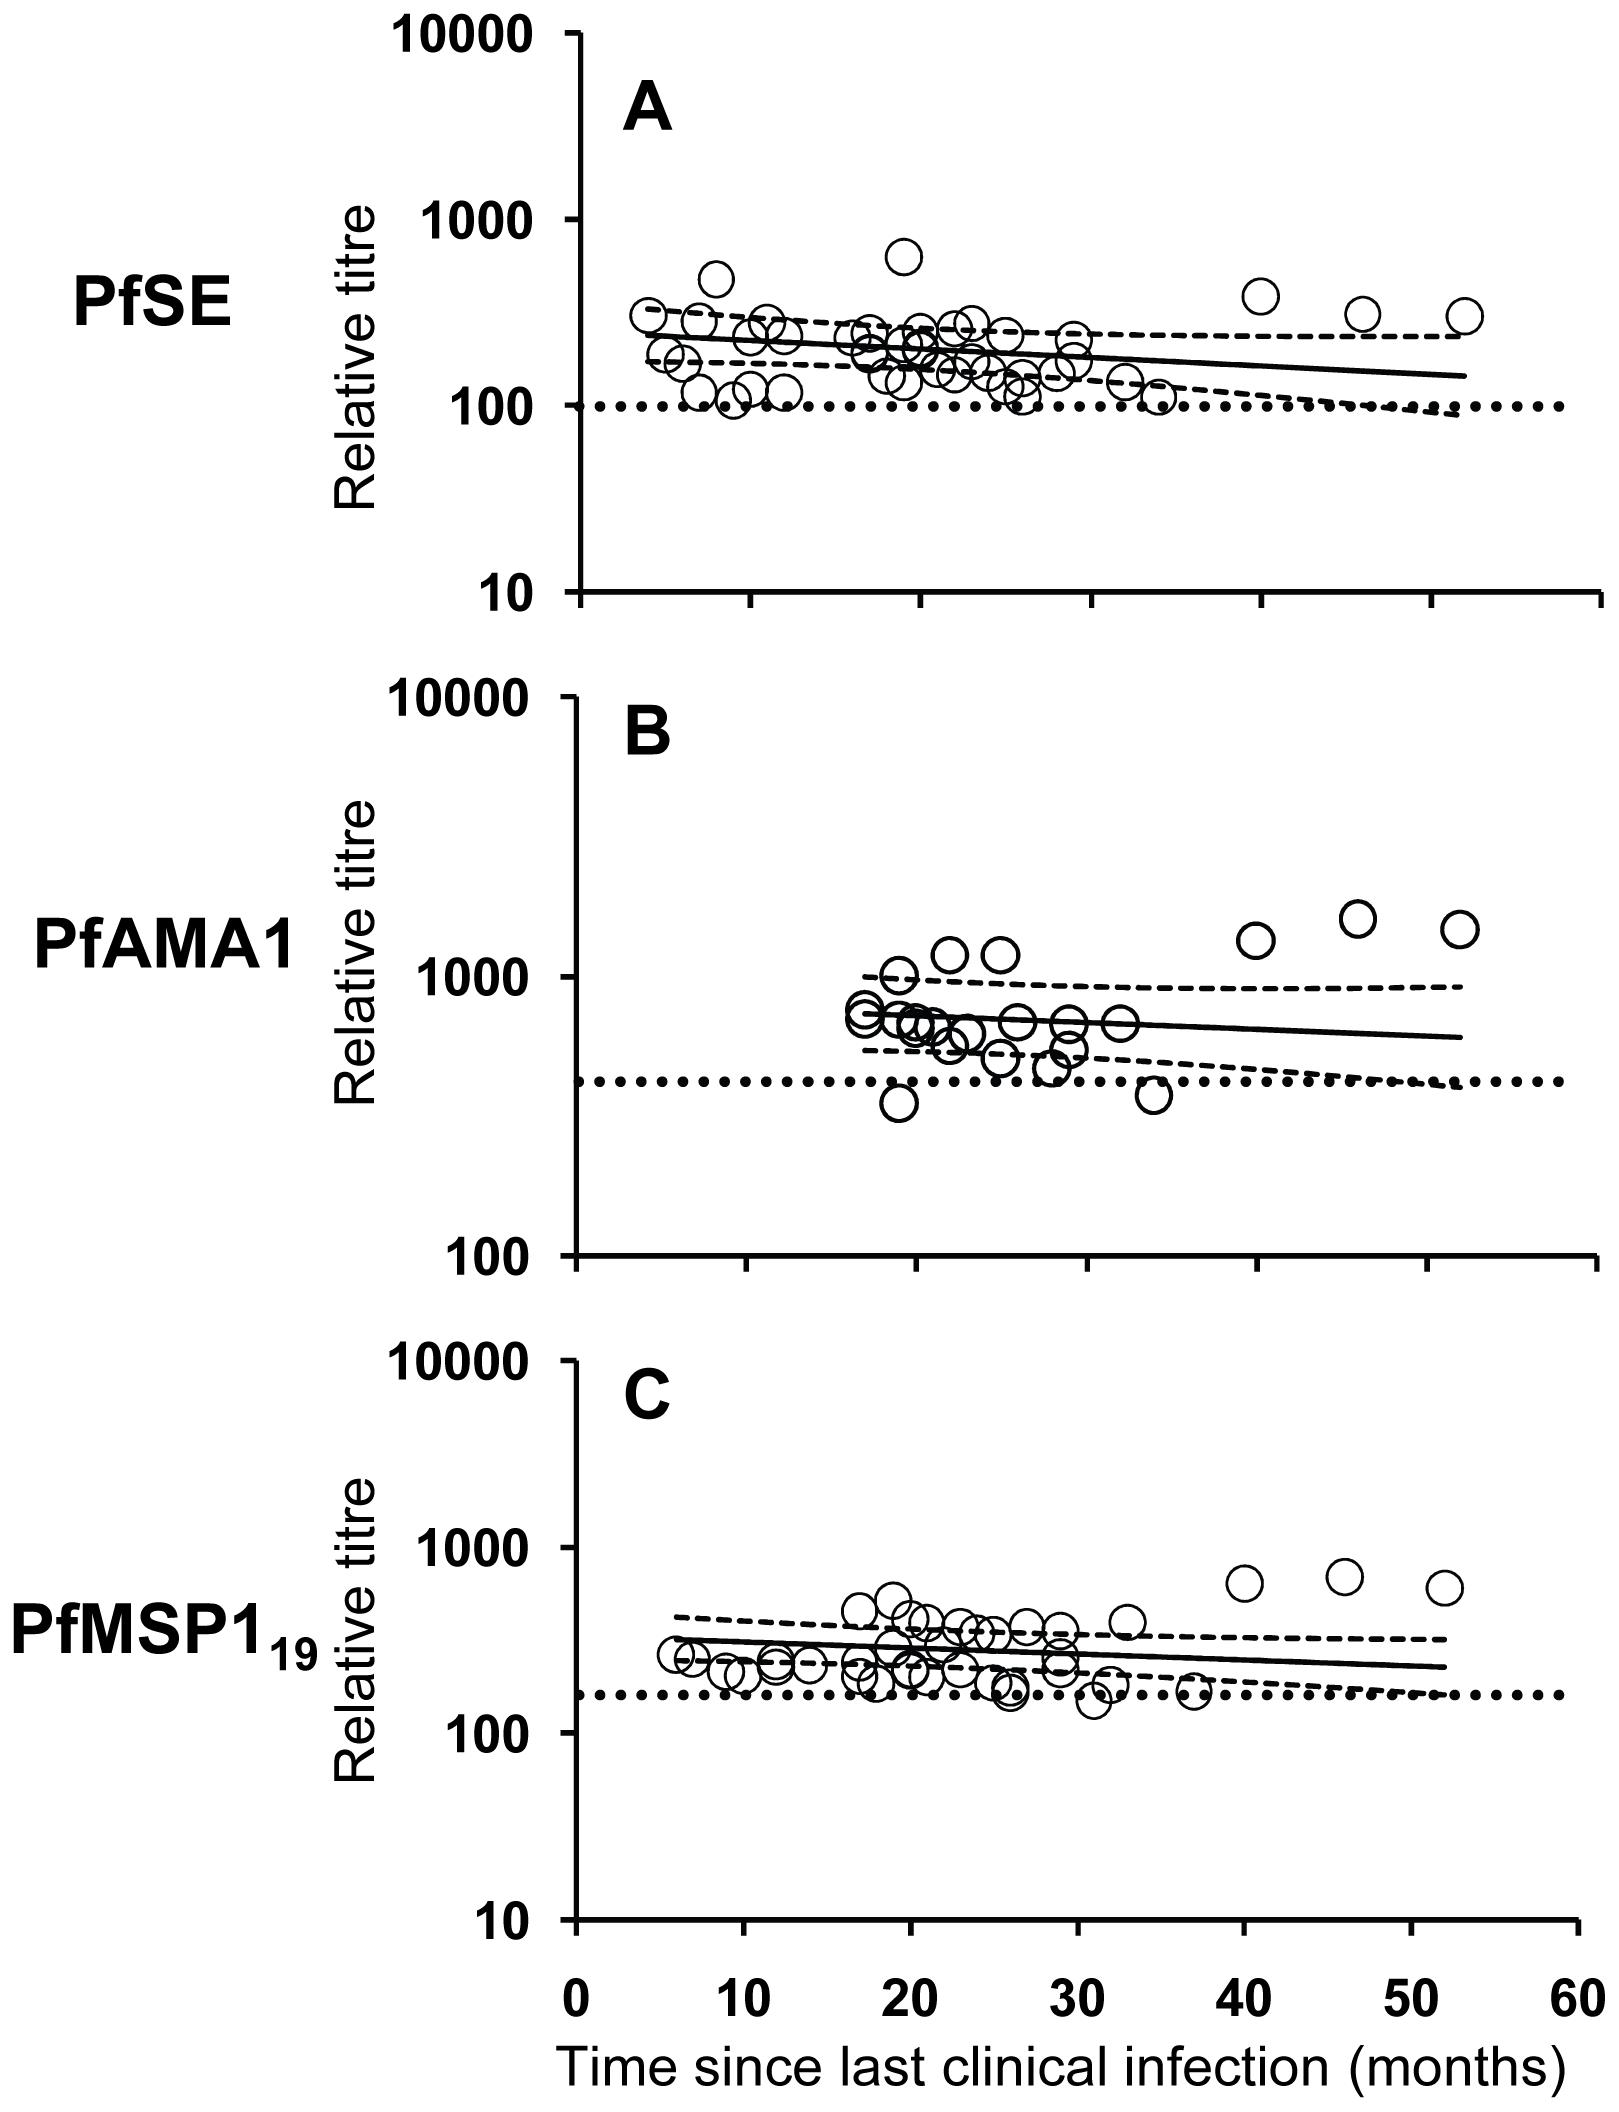 Longevity of anti-malarial antibody responses.